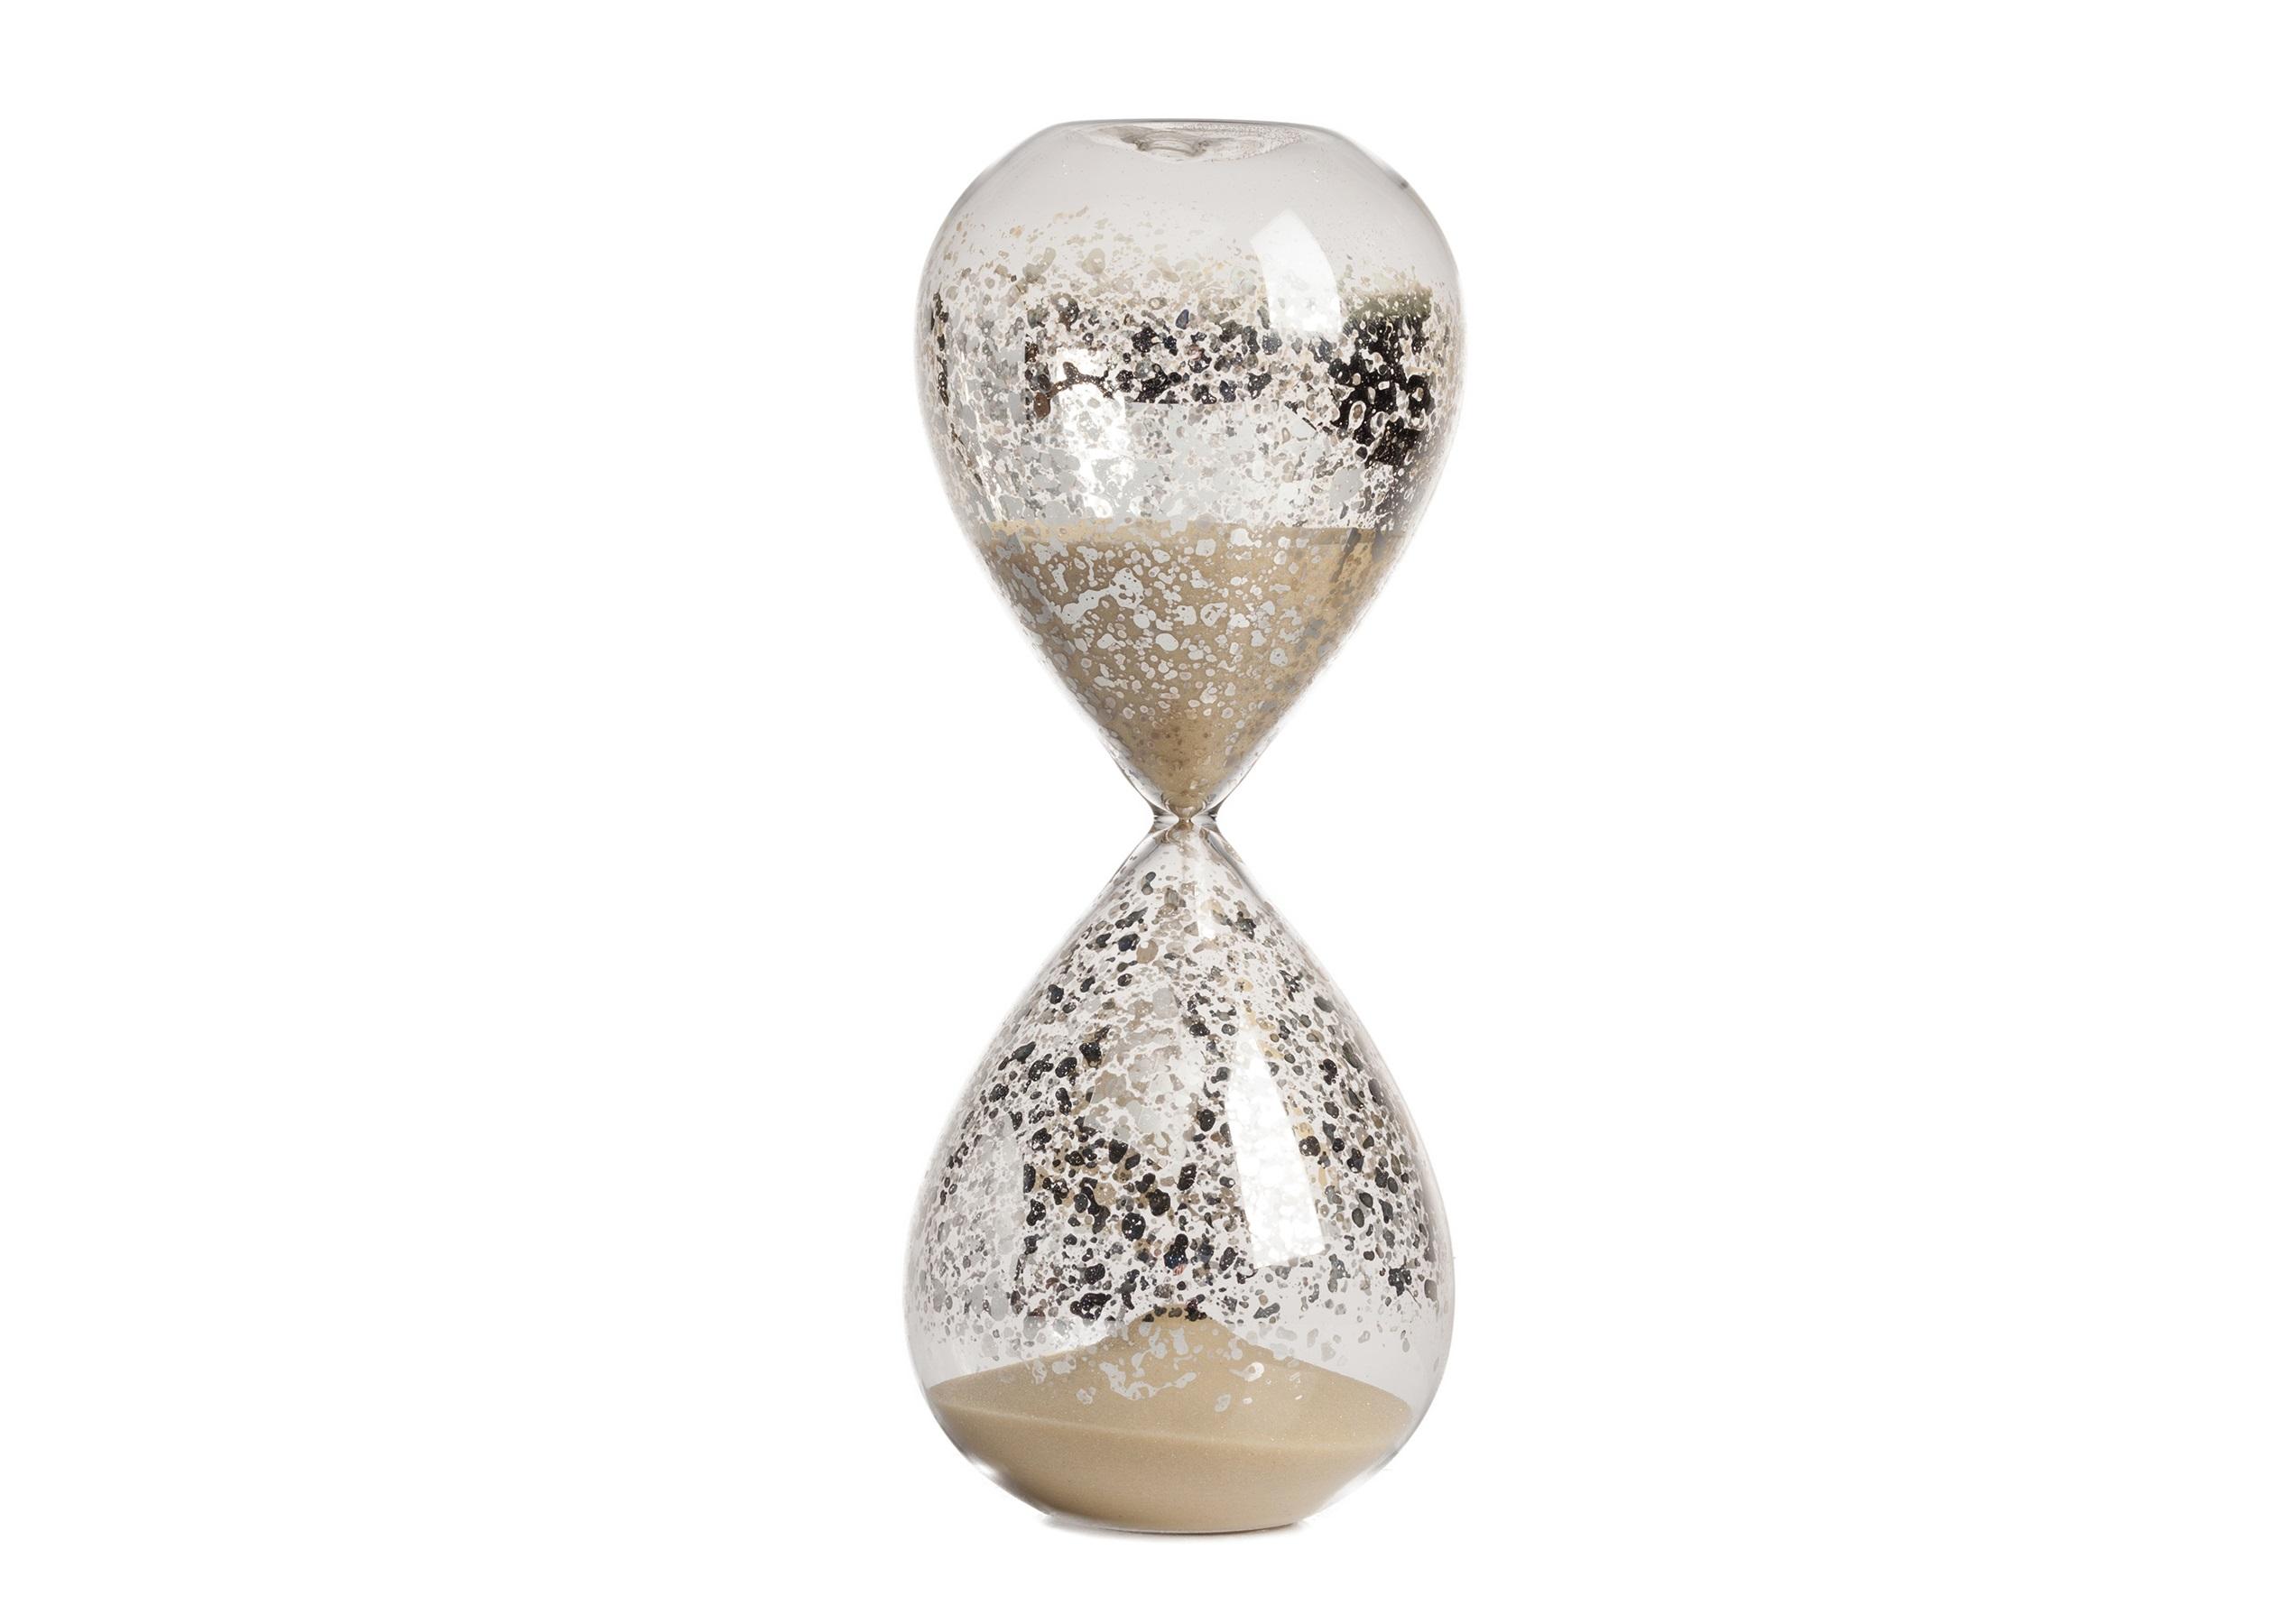 Песочные часы IdinaДругое<br>Песочные часы на 30 минут&amp;amp;nbsp;<br><br>Material: Стекло<br>Length см: None<br>Width см: None<br>Height см: 20,5<br>Diameter см: 8